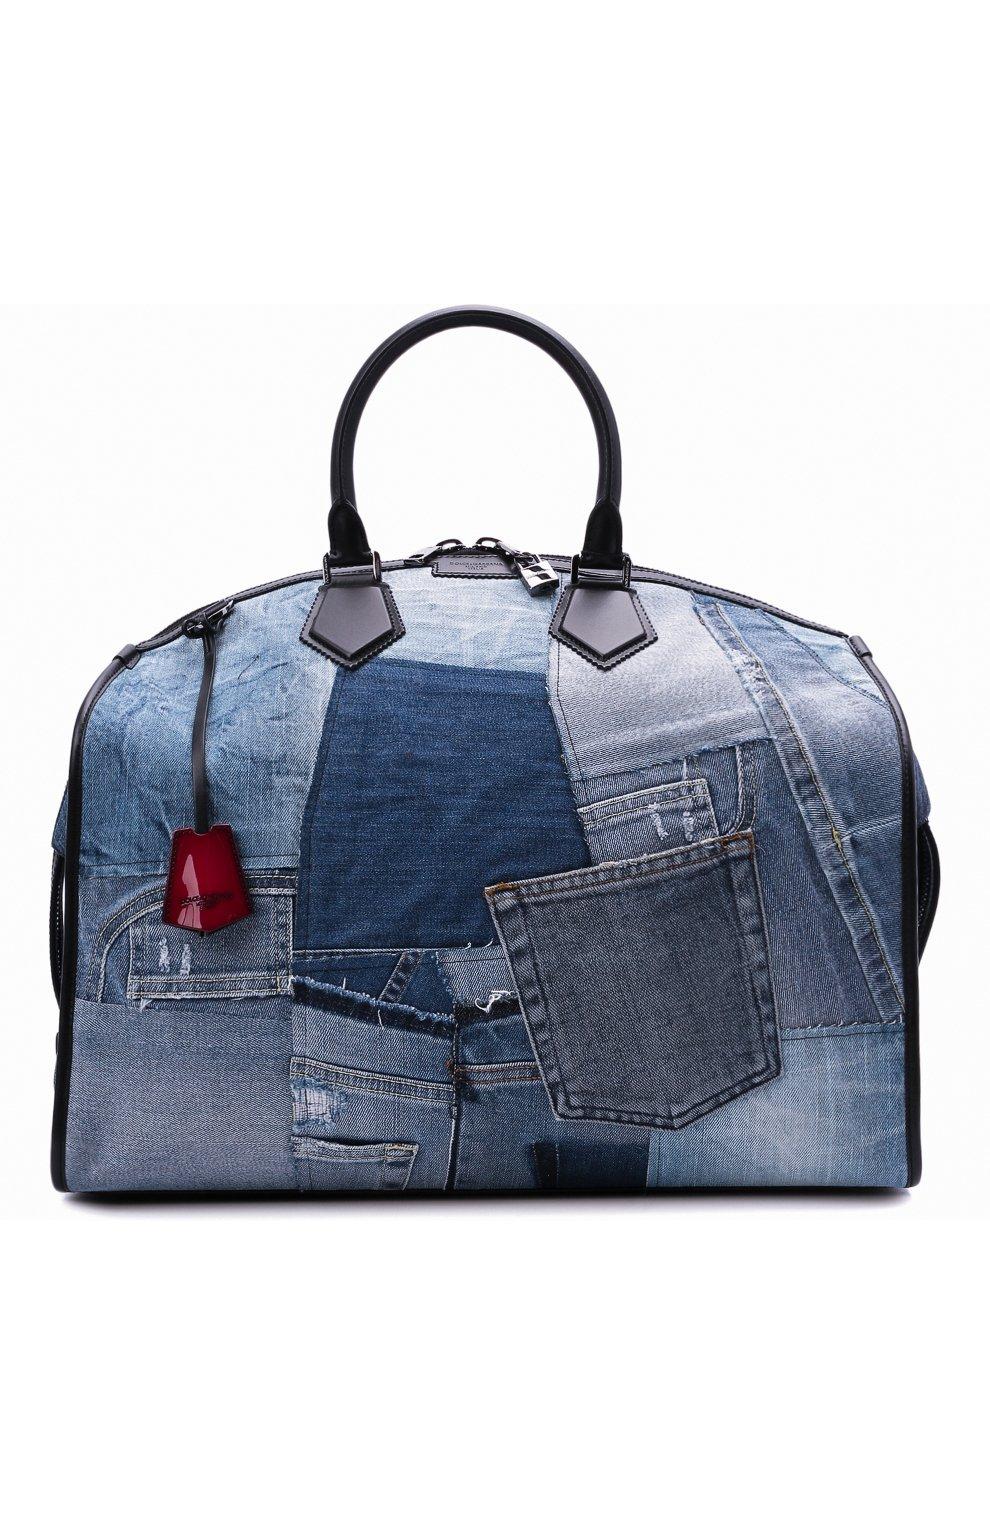 Мужская текстильная дорожная сумка edge DOLCE & GABBANA синего цвета, арт. BM1789/AW347 | Фото 7